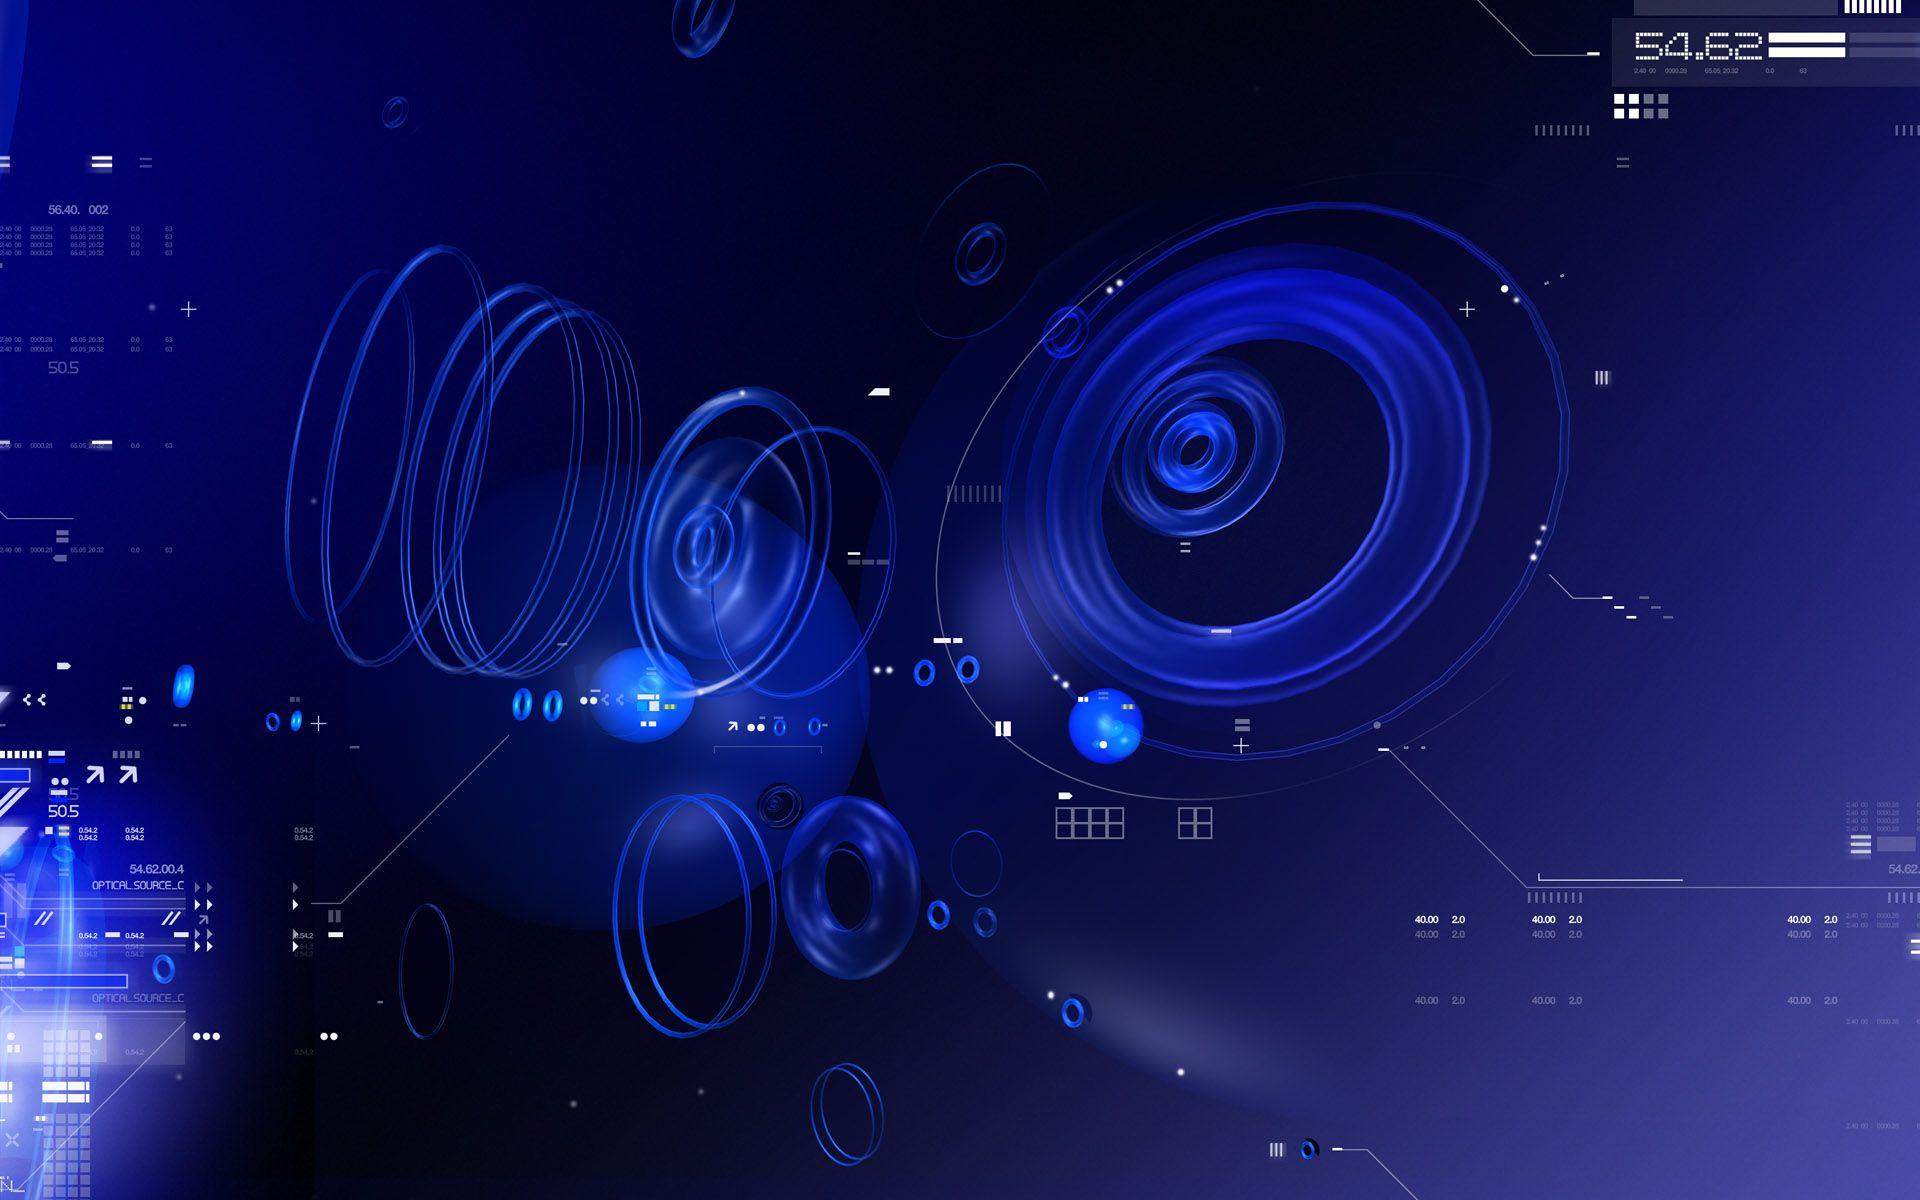 Blue Tech Circles Technology Wallpaper Android Wallpaper Blue Hi Tech Wallpaper